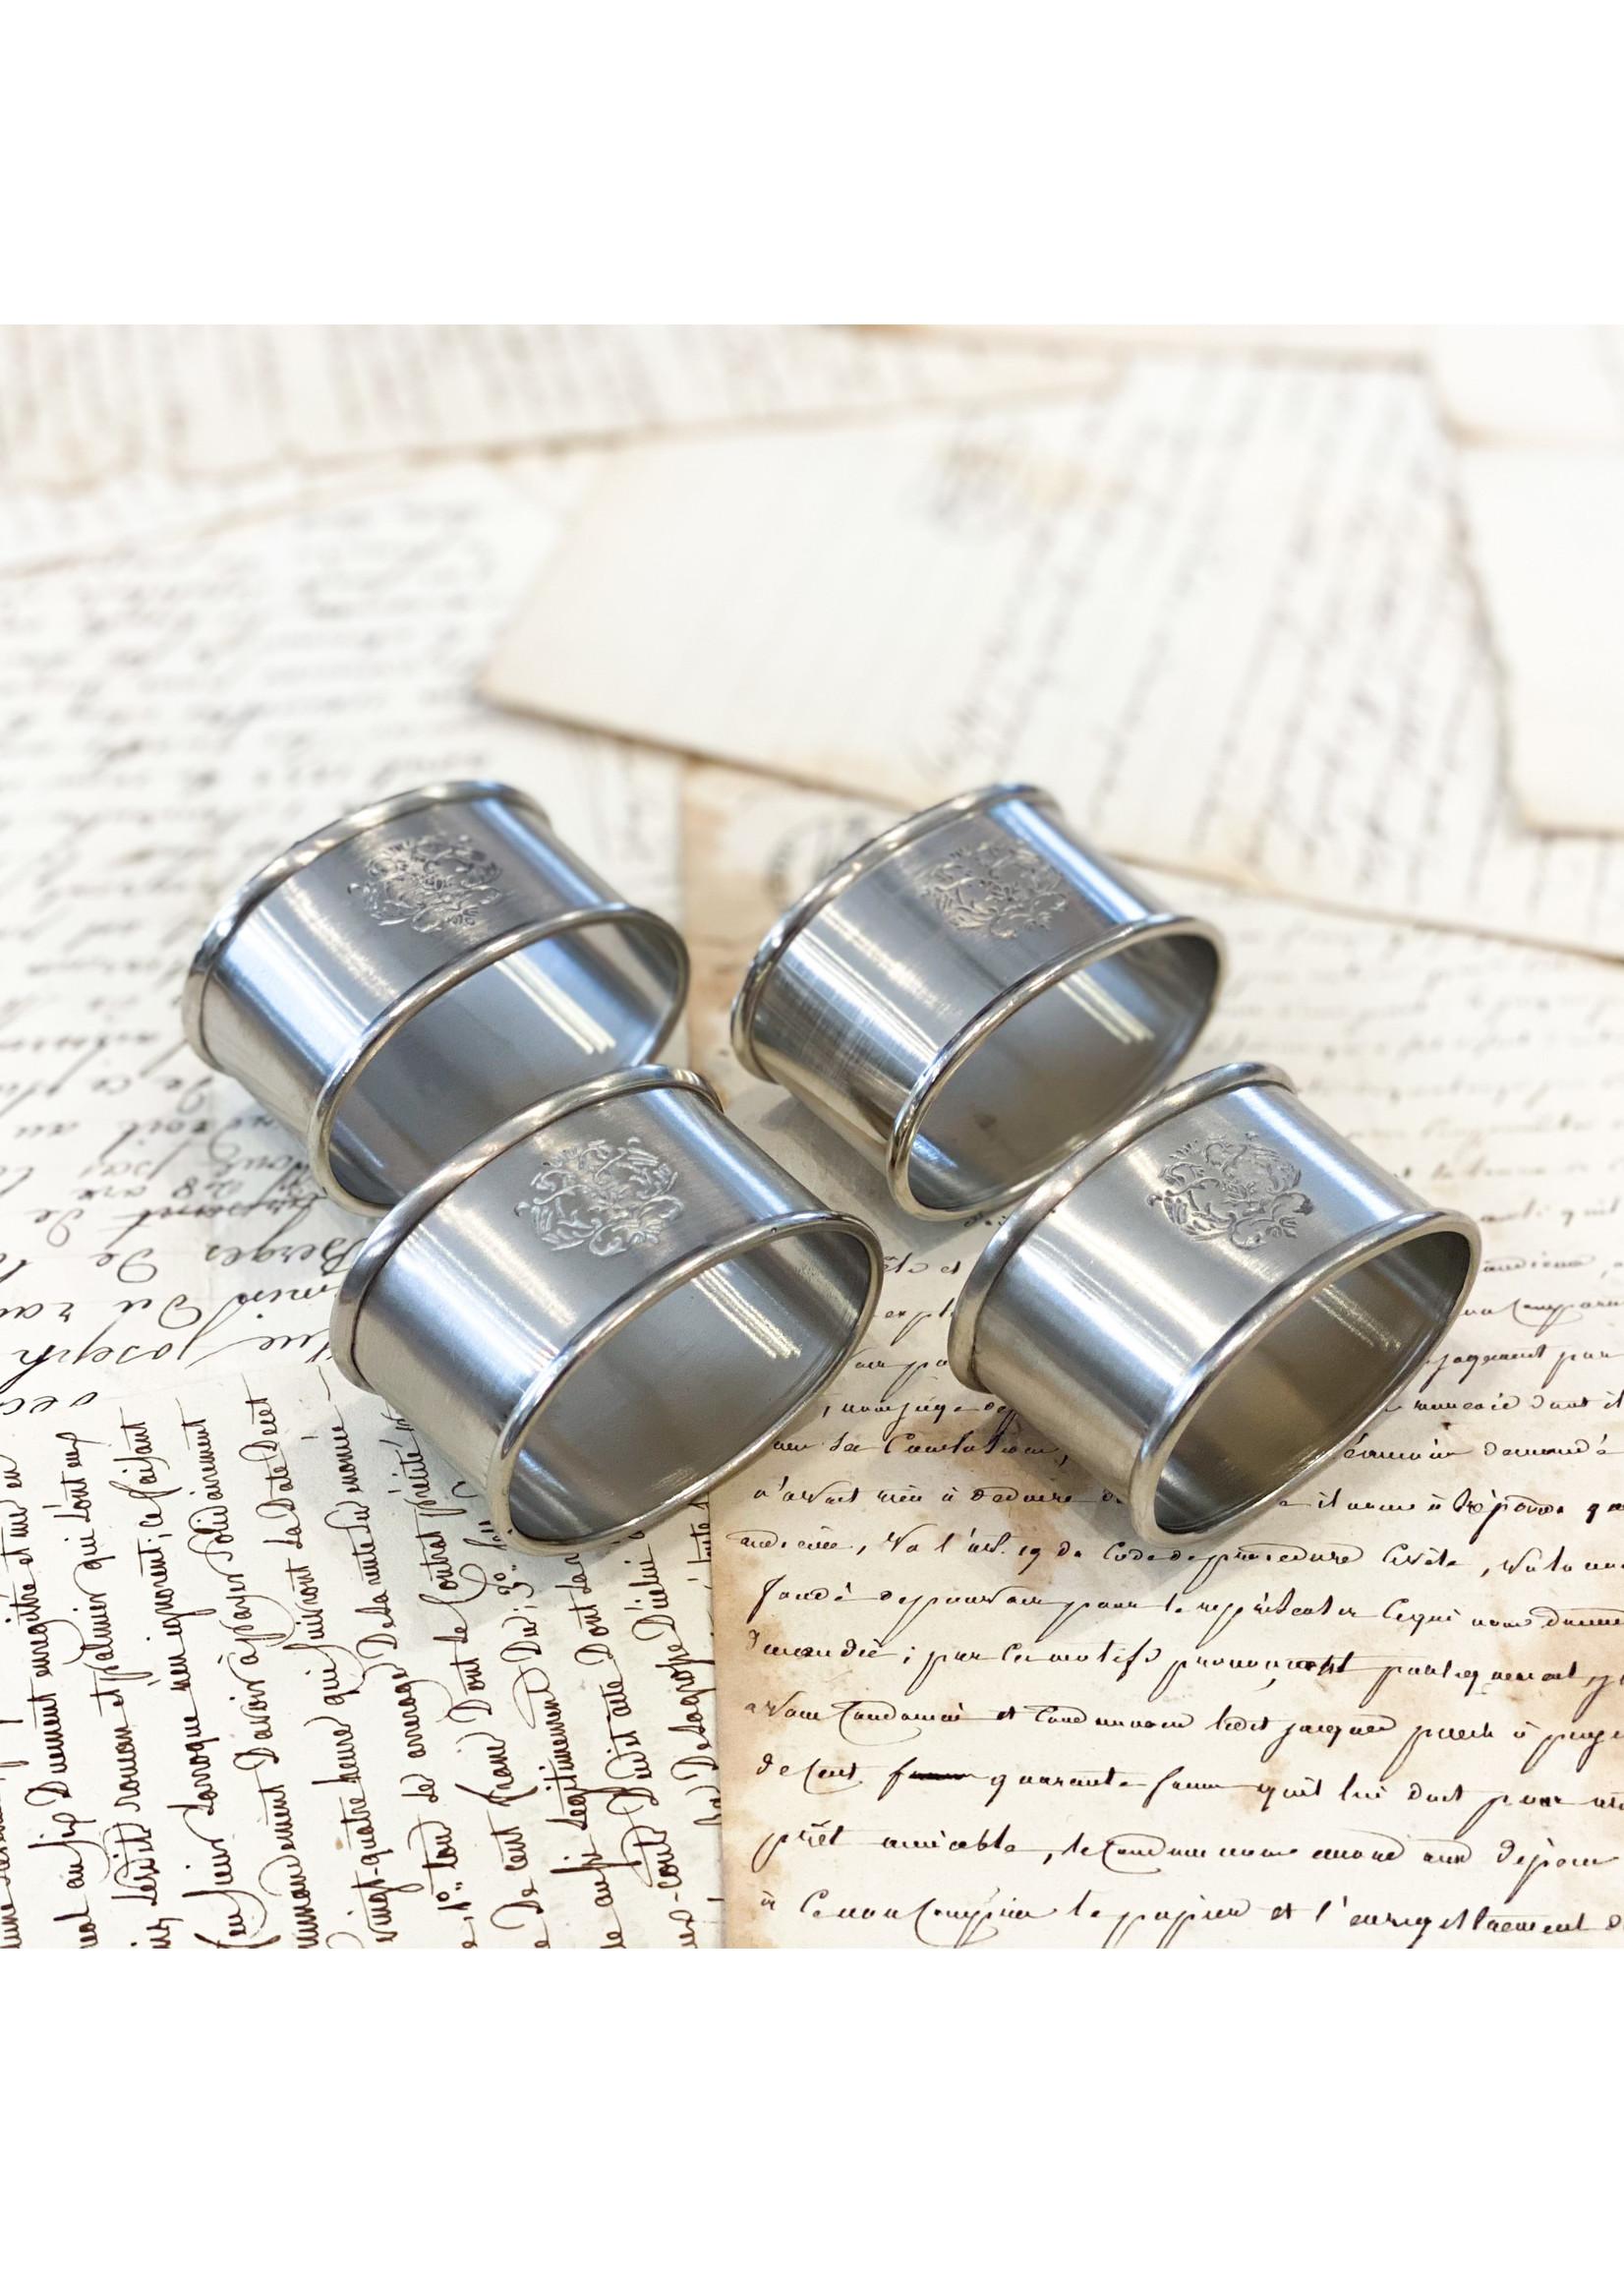 Crown Linen Napkin Rings - Damask (set of 4)